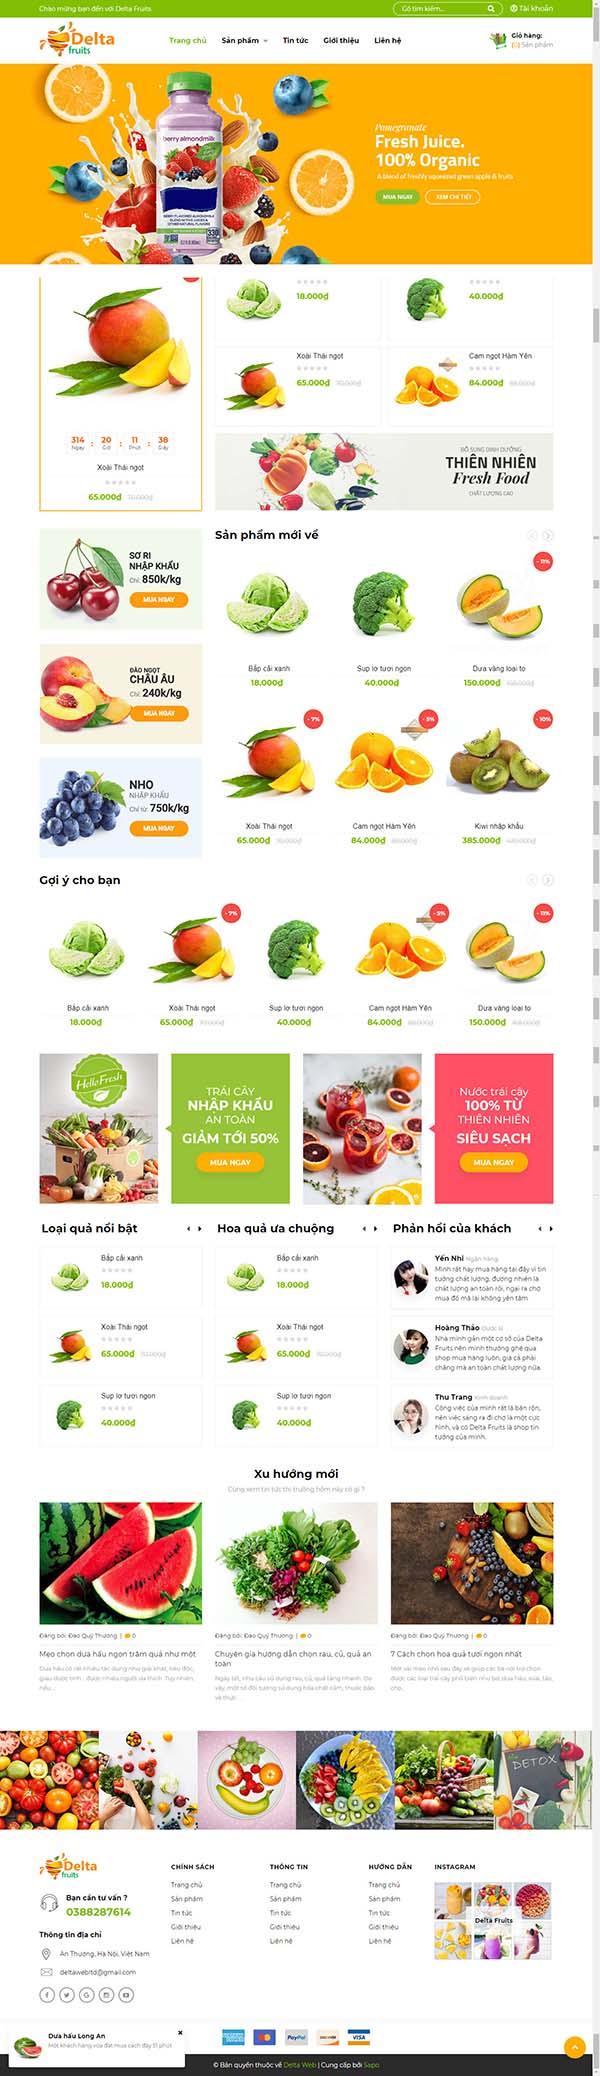 Thiết kế Mẫu website thực phẩm rau hoa quả RHQ17